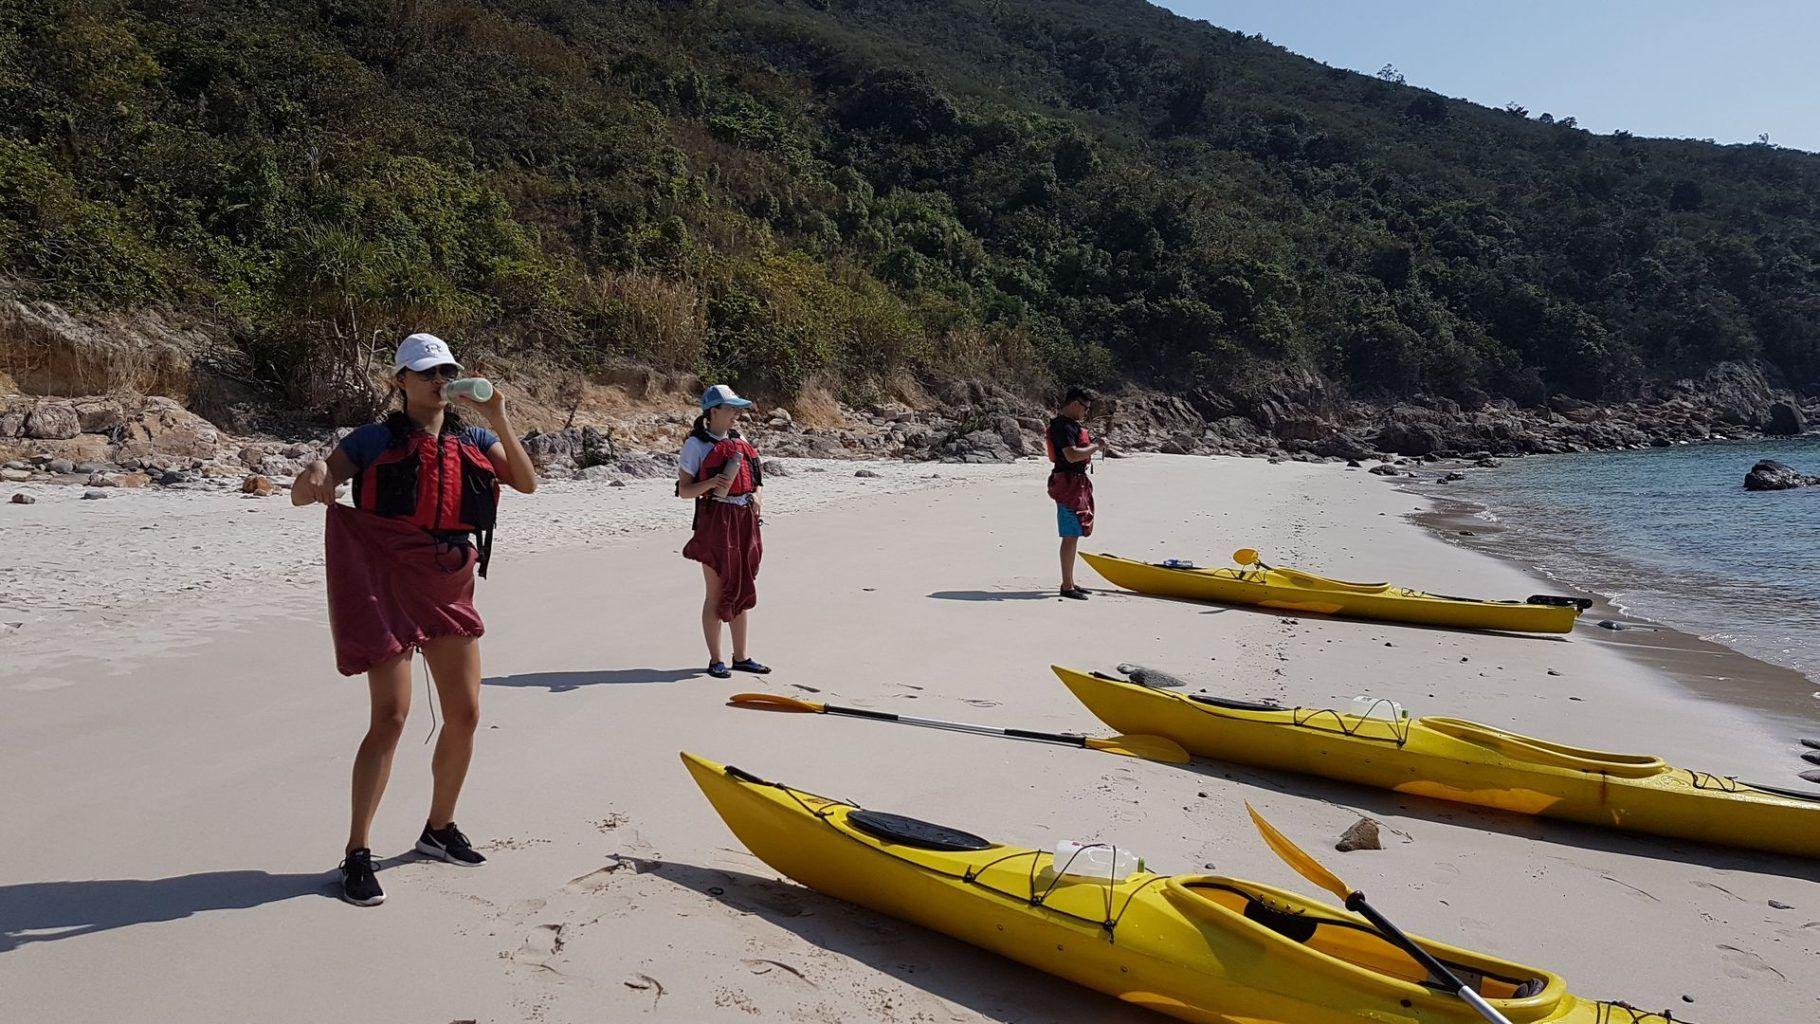 24 Jan 2019 UNESCO Geopark 1 day sea kayak trip Hong Kong 29